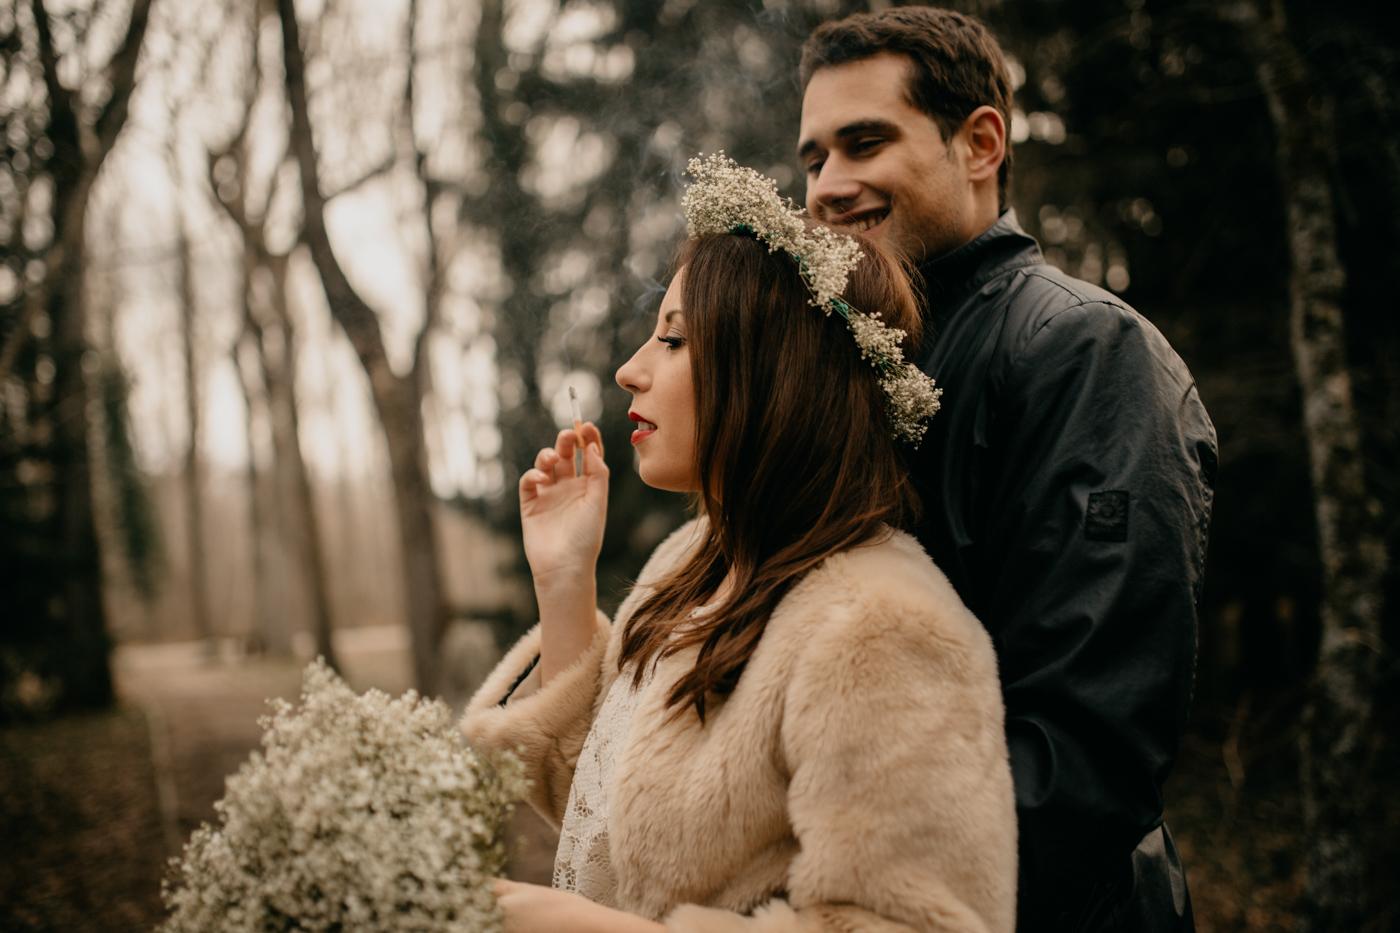 Velvet-Hush-fotografos-boda-al-aire-libre-madrid-109